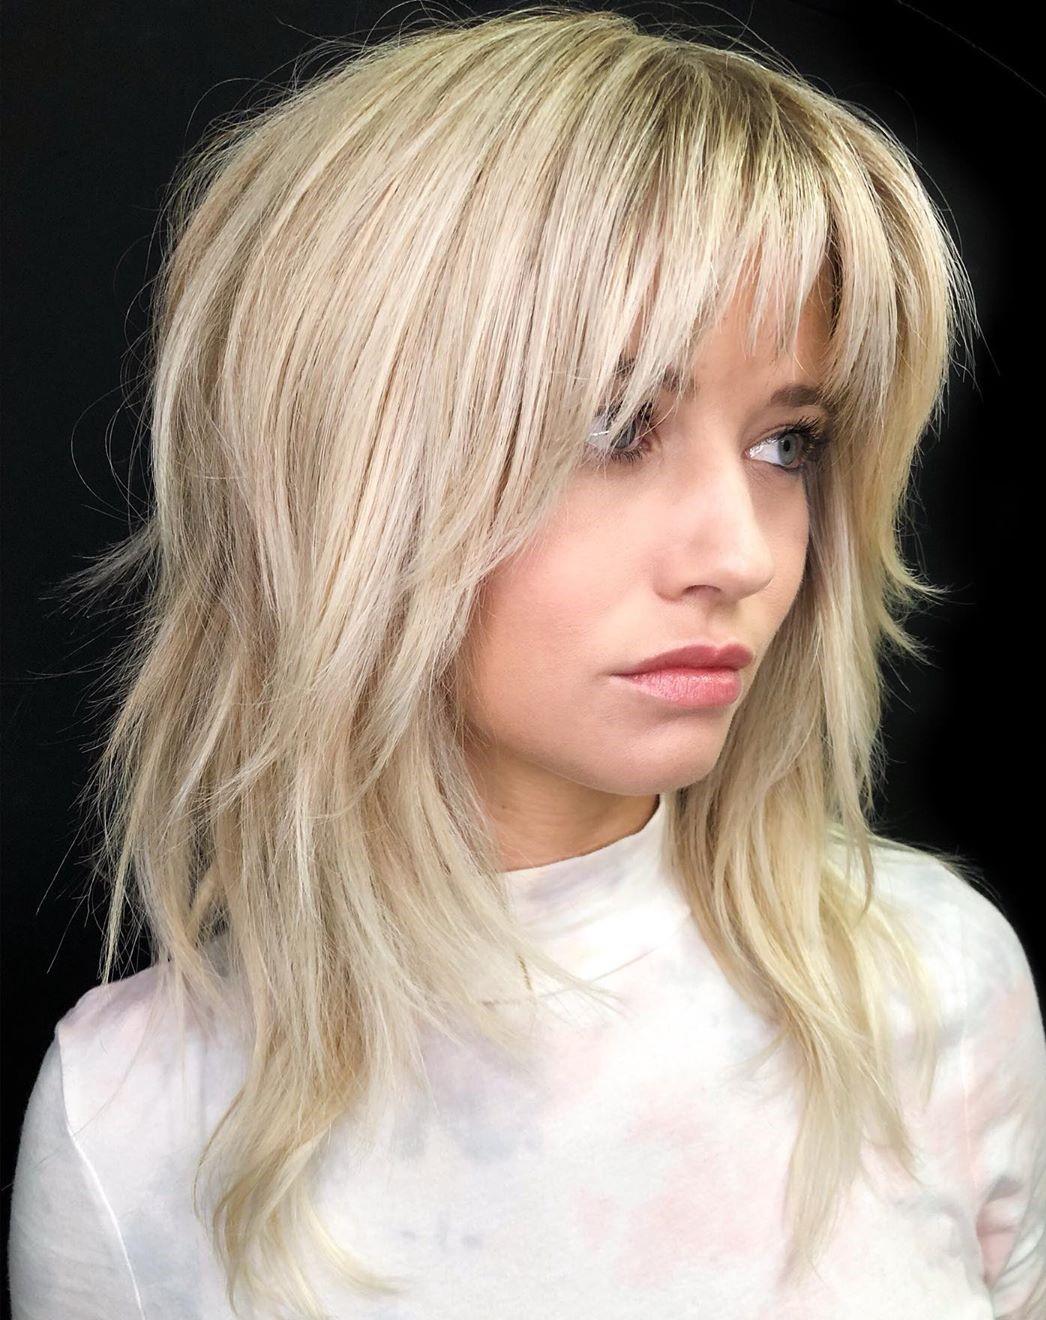 Medium-Length Light Blonde Shag